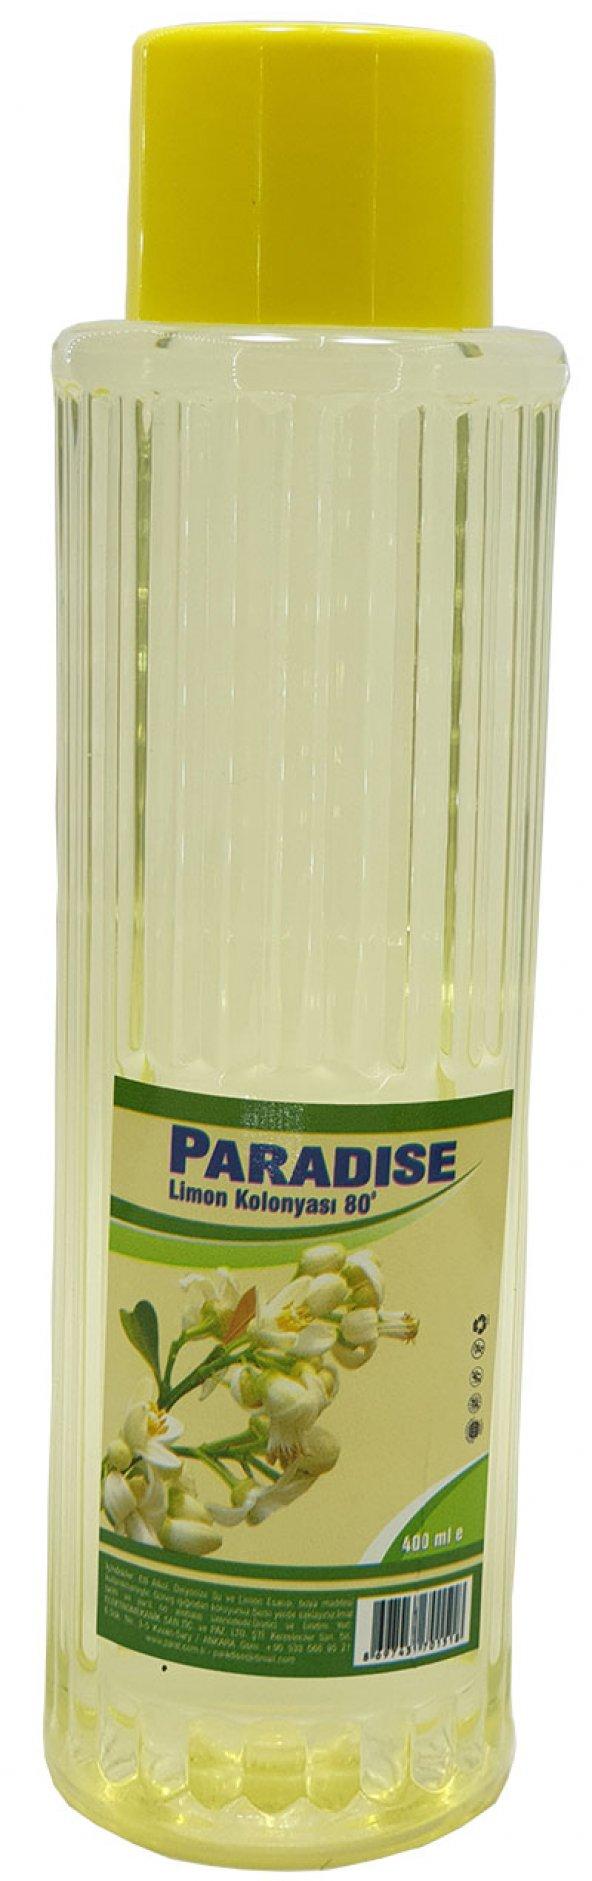 Paradise limon kolonya 400 ml 80 drc